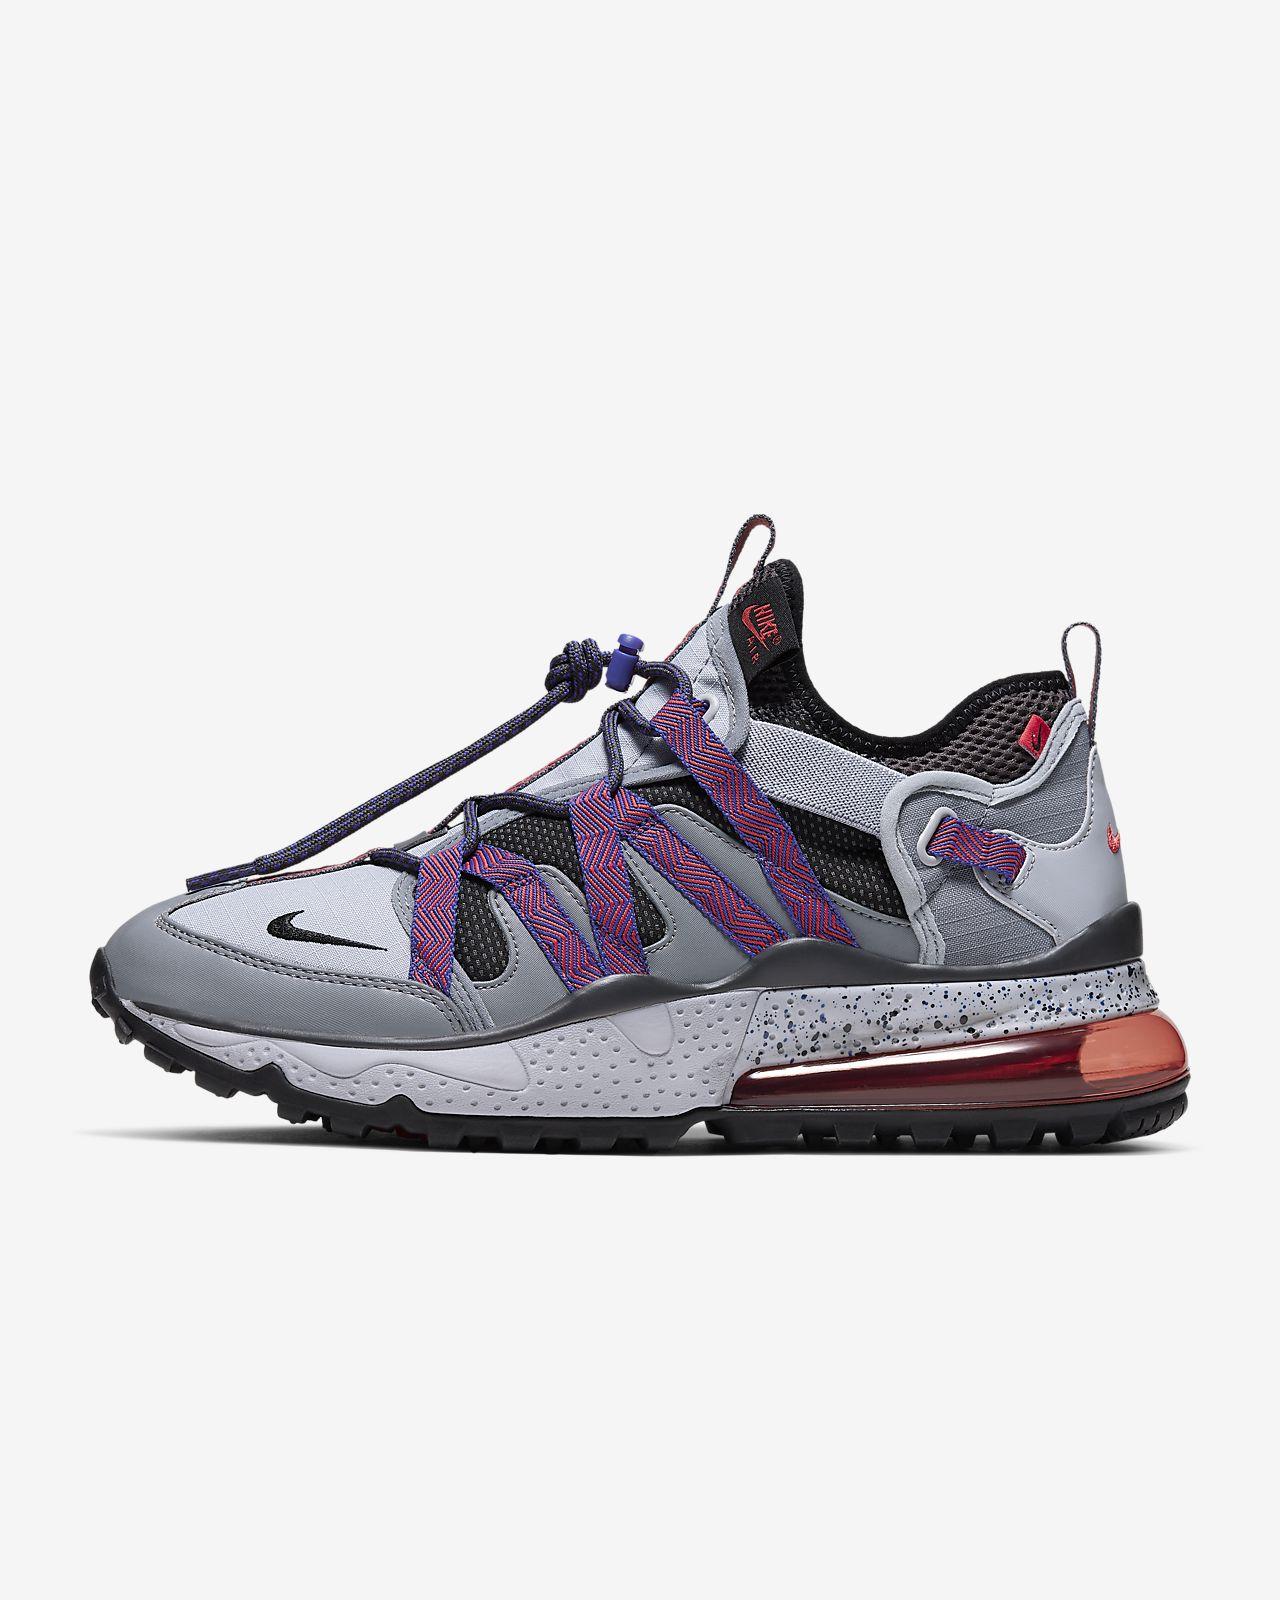 Nike Air Max 270 Bowfin | Getswooshed